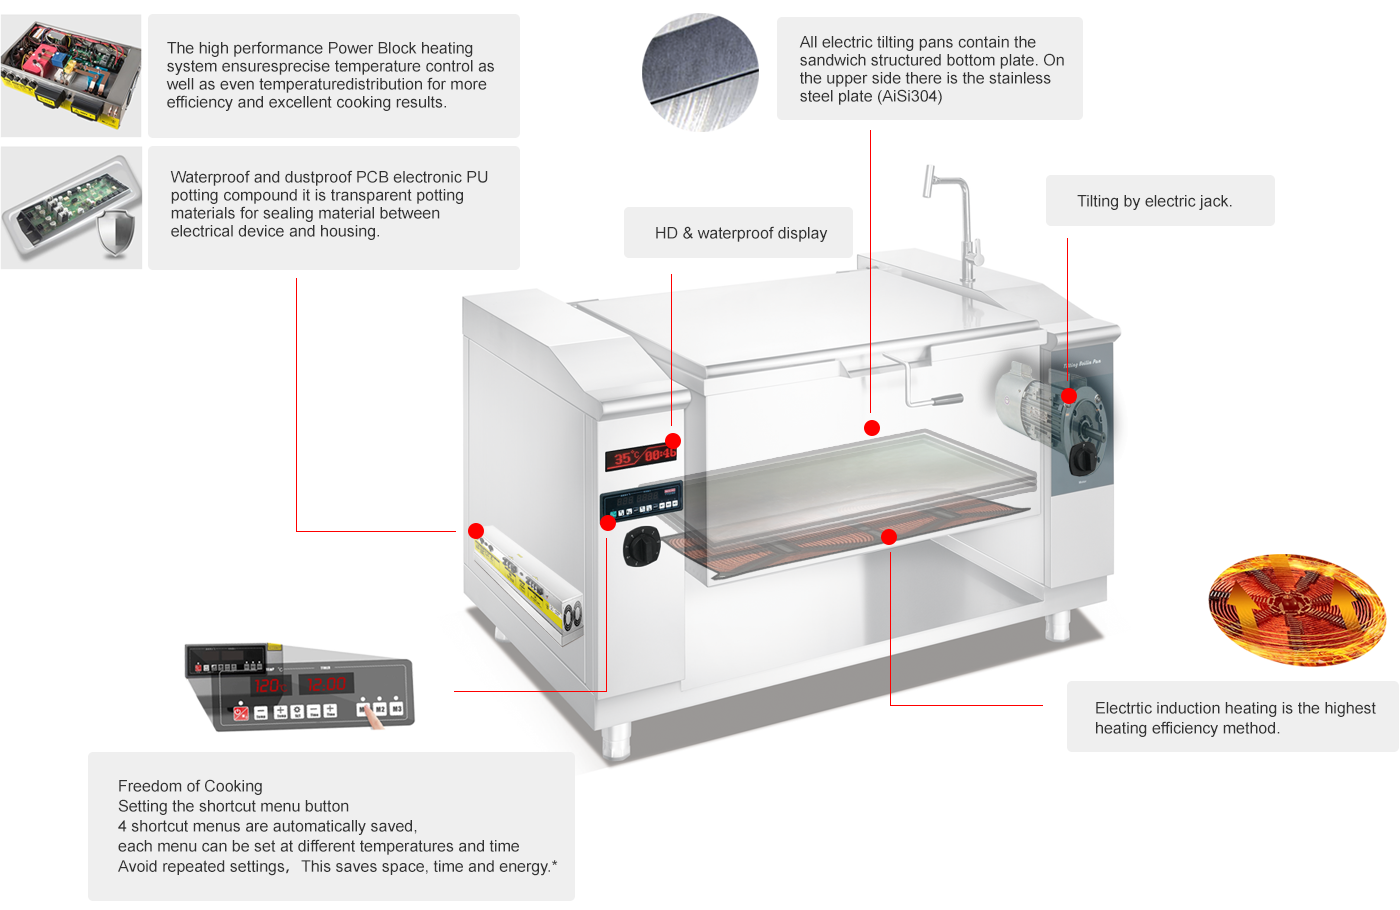 Modular kitchen systems | SHIELD service | Tilting pan